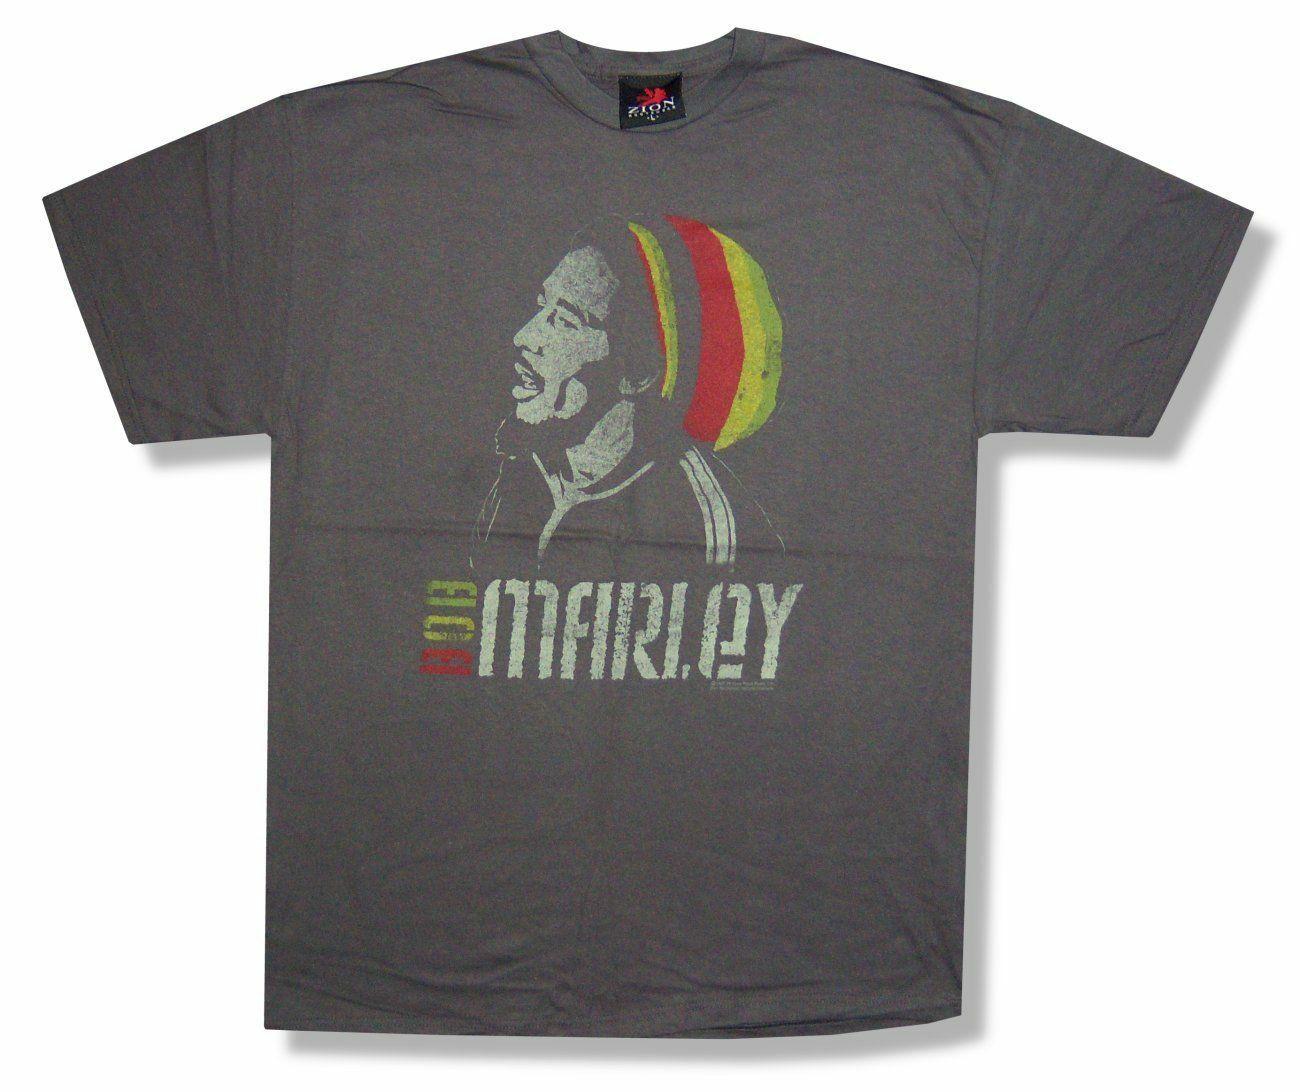 Bob Marley Striped Beanie Mens Heather Brown T Shirt New Official Reggae Music